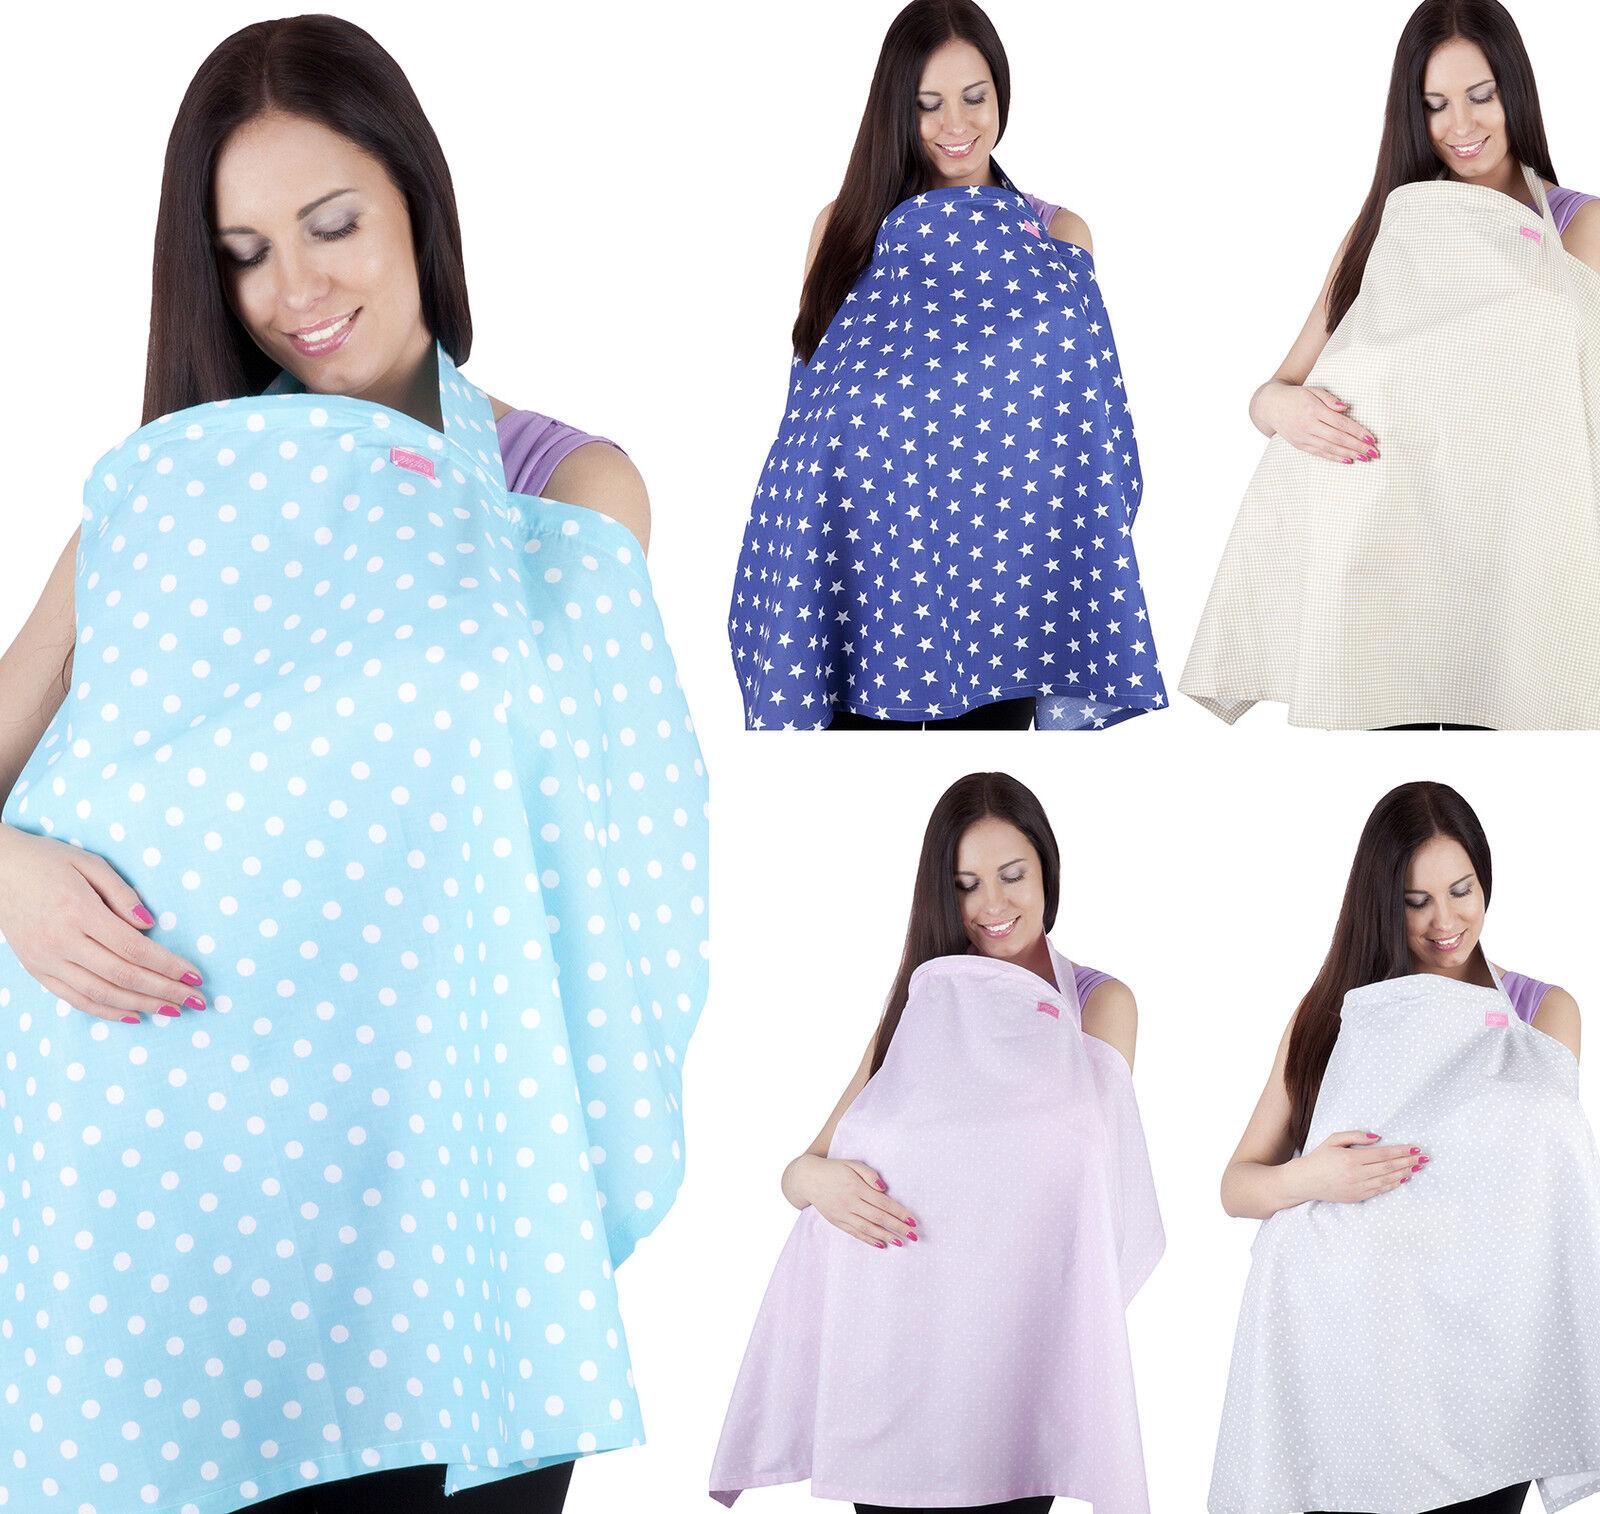 Nursing shawl scarf Nursing Cover Sling Blanket Breastfeeding 4010 Mija